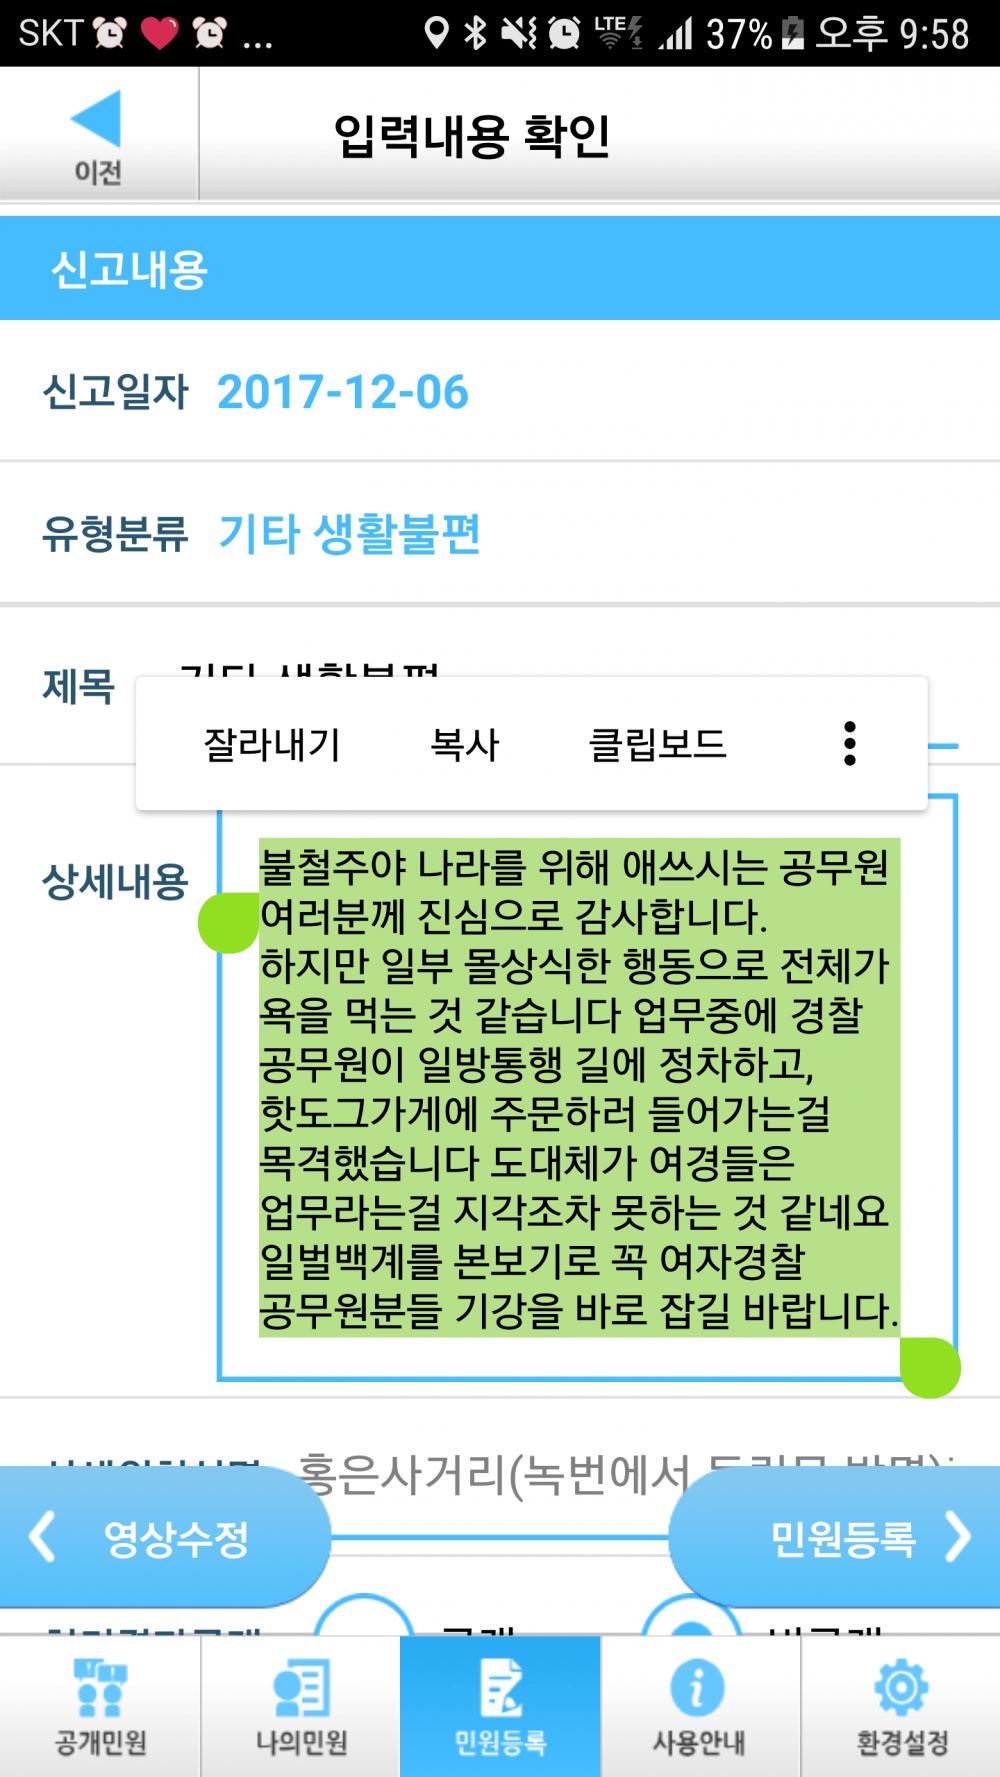 imis1512607897.png 핫도그 사먹는 여경을 신고한 보배인